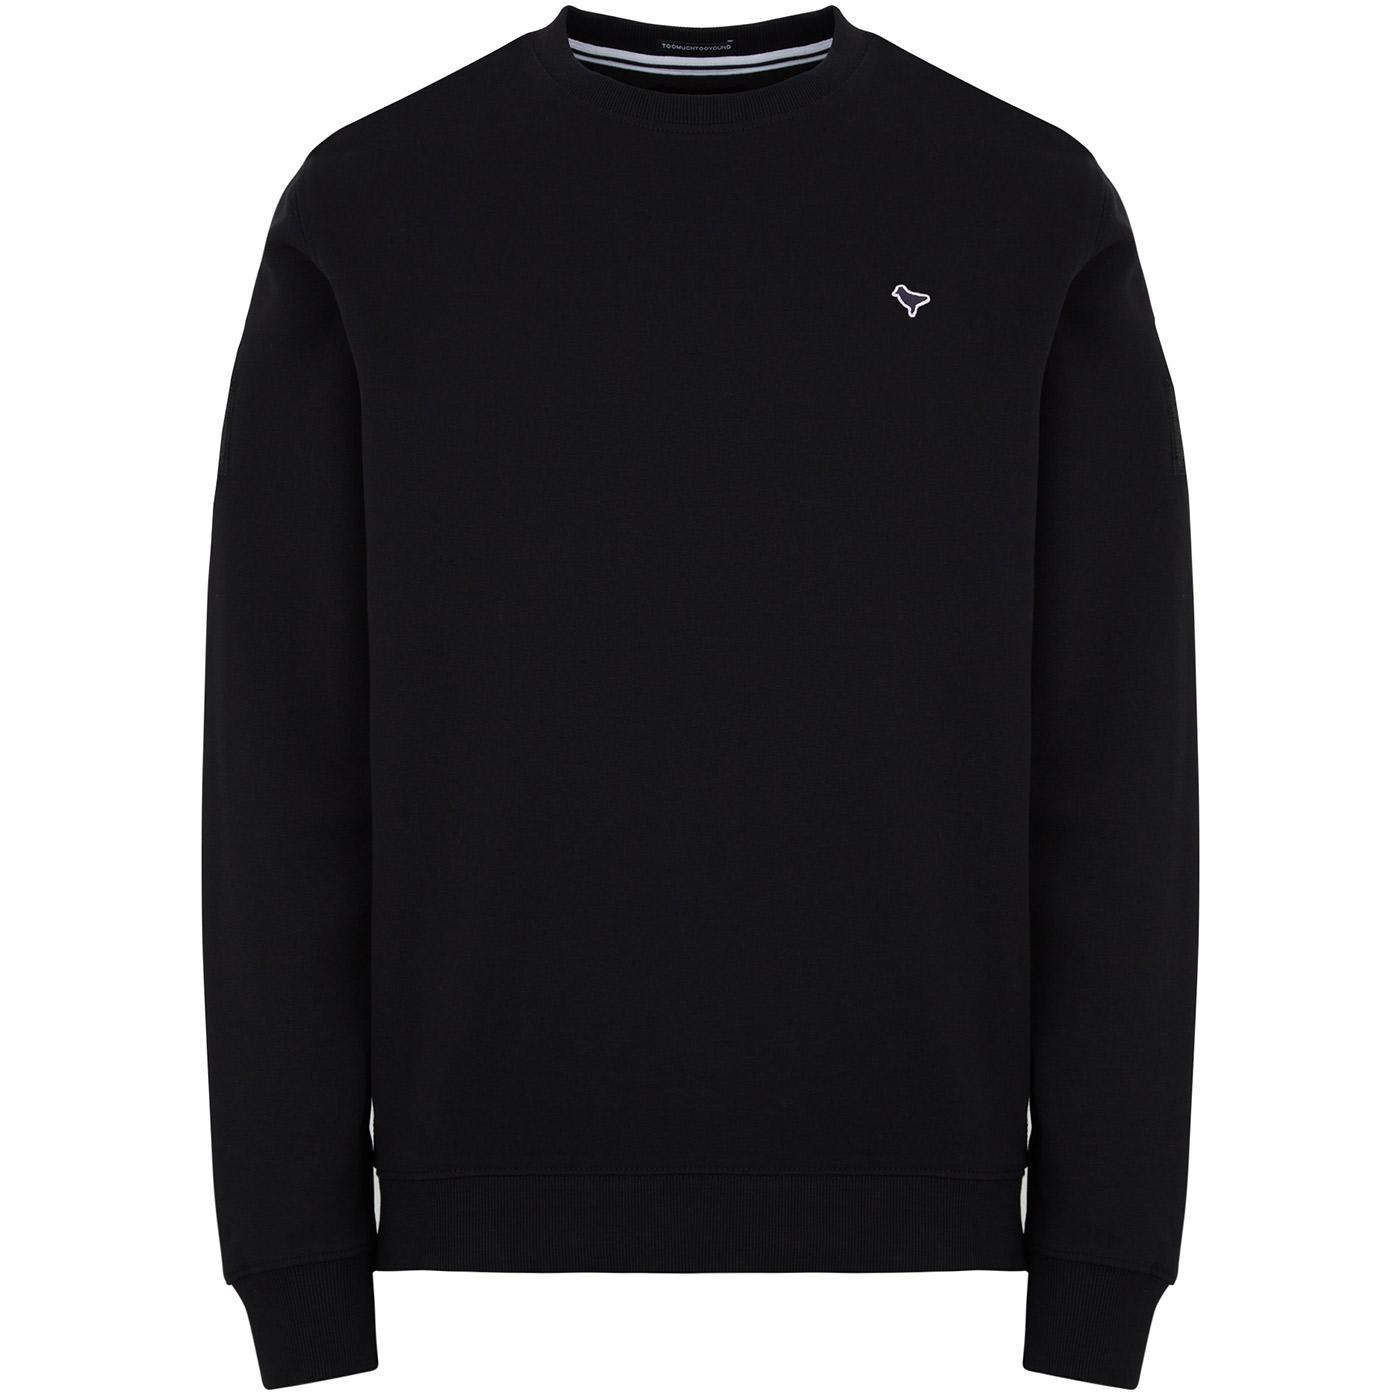 San Jose WEEKEND OFFENDER Retro Sweatshirt (Black)